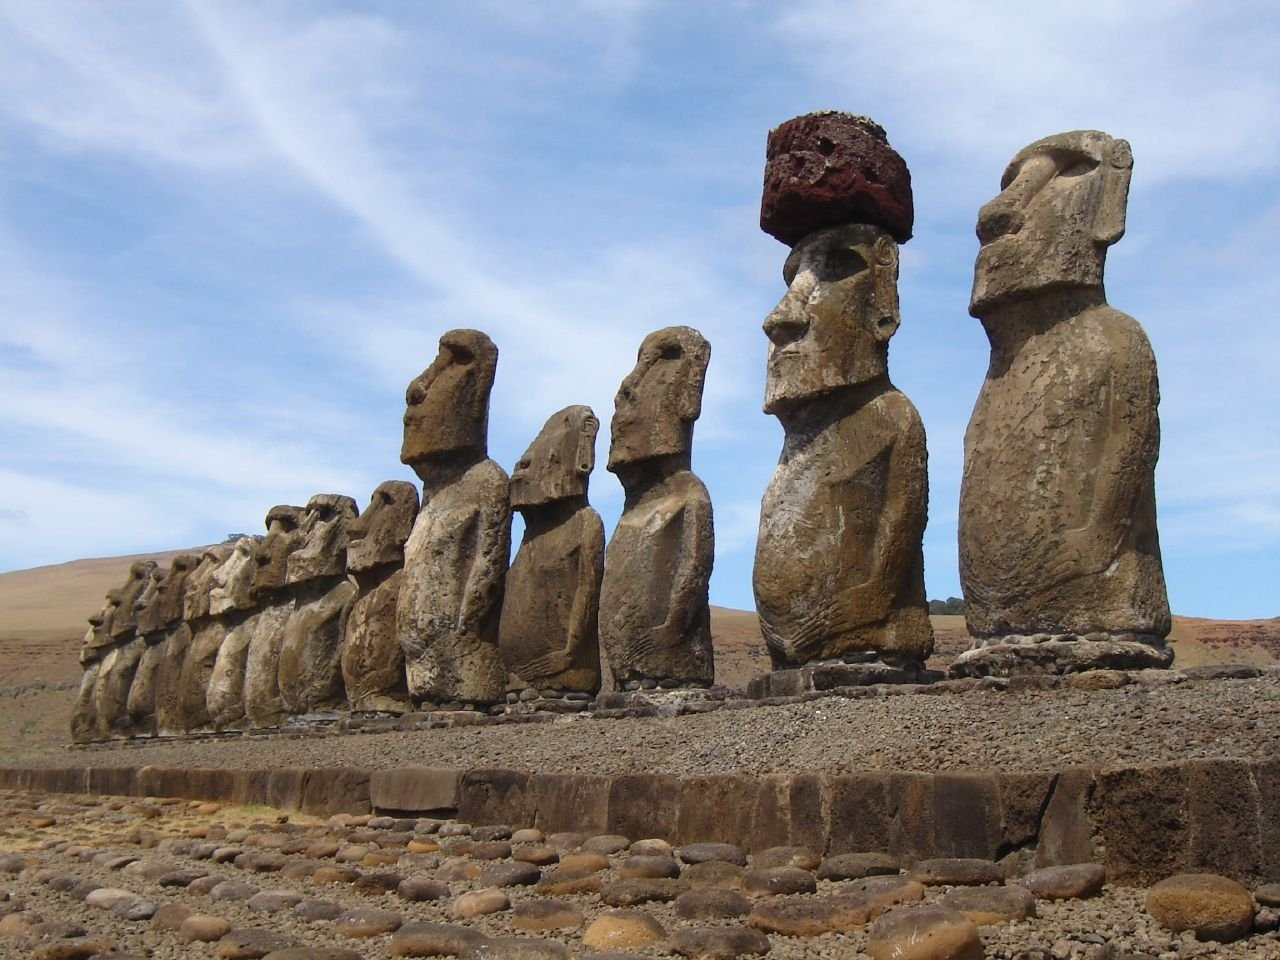 Фото Скульптуры Пасхи в ряд. Чили, Valparaiso, Исла де Паскуа, Camino Vaitea Anakena